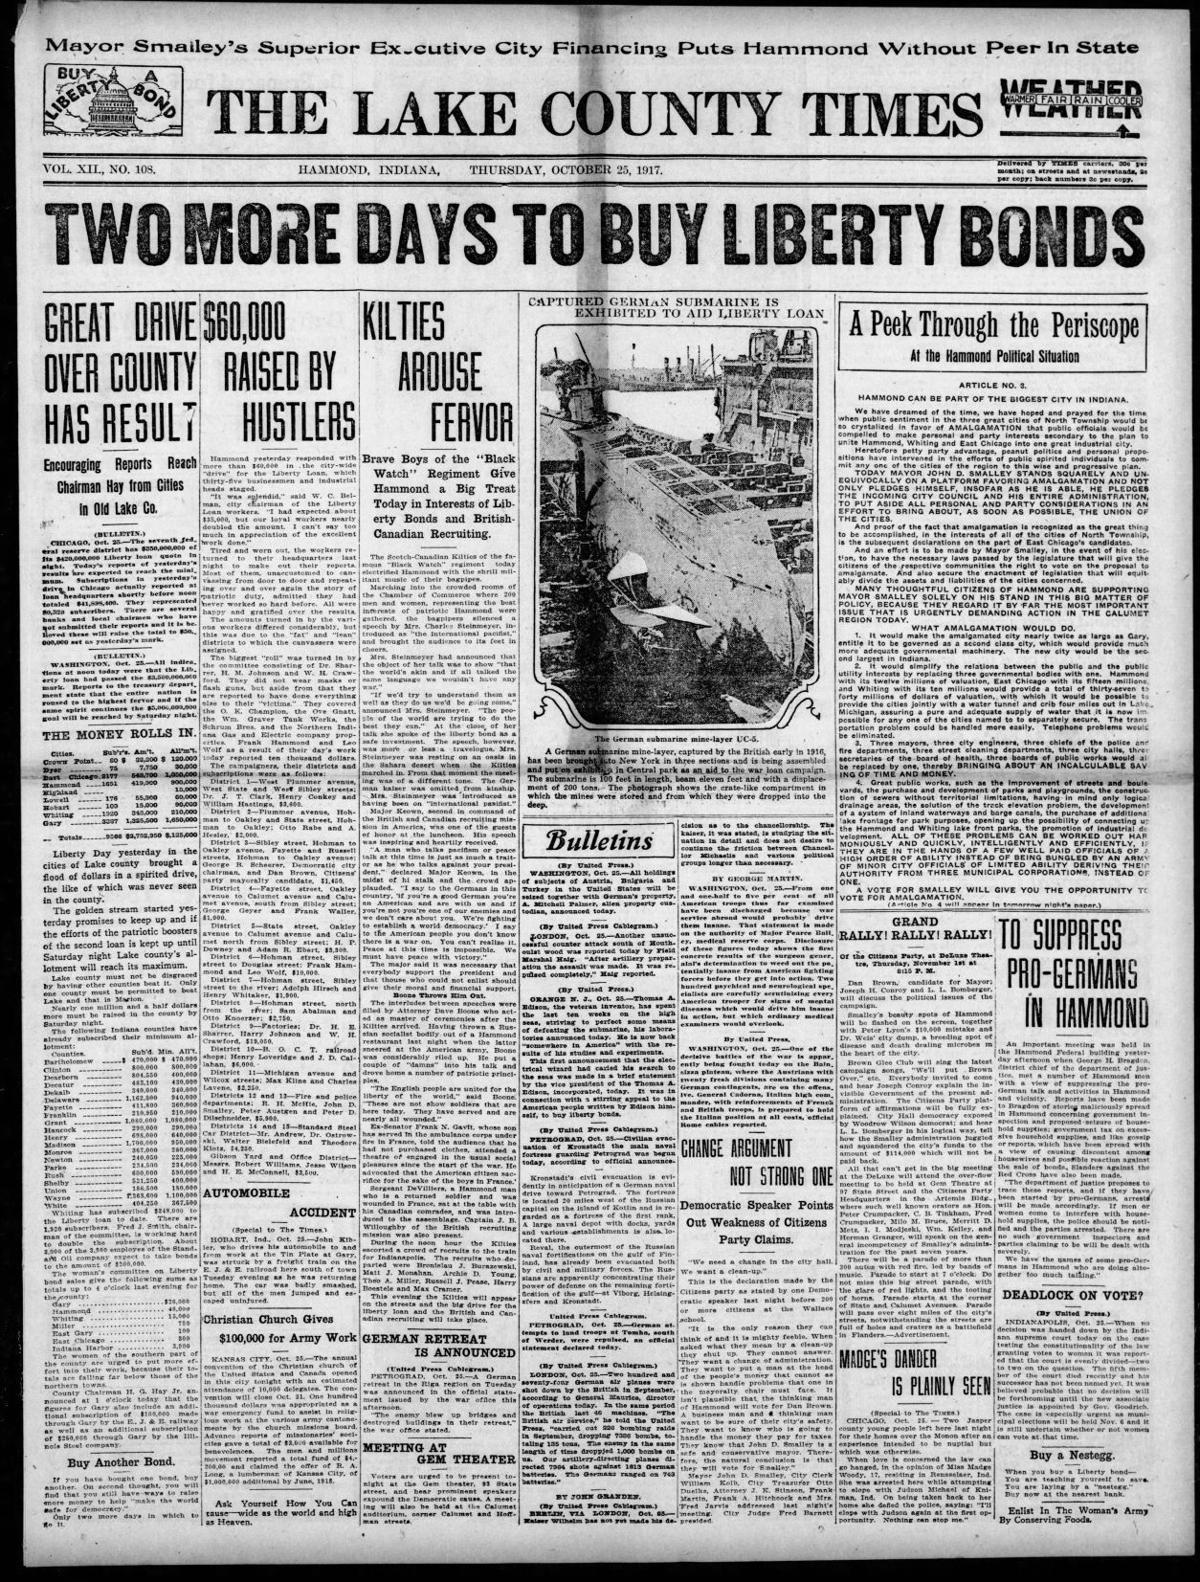 Oct. 25, 1917: To Suppress Pro-Germans in Hammond